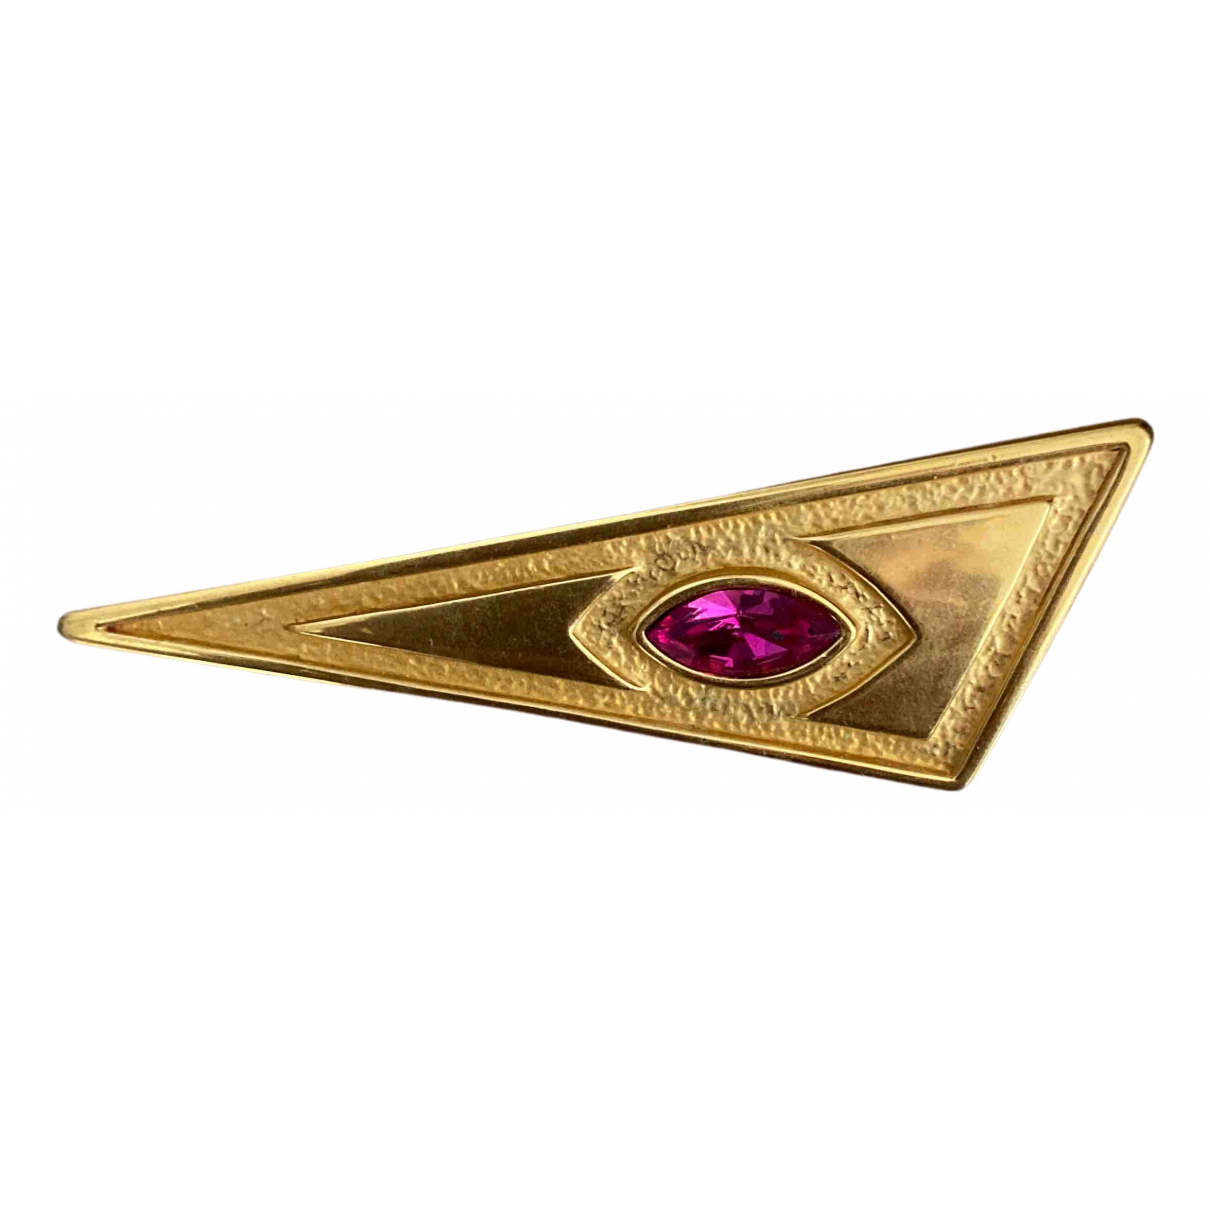 Broche Art Deco en Metal Dorado Non Signe / Unsigned